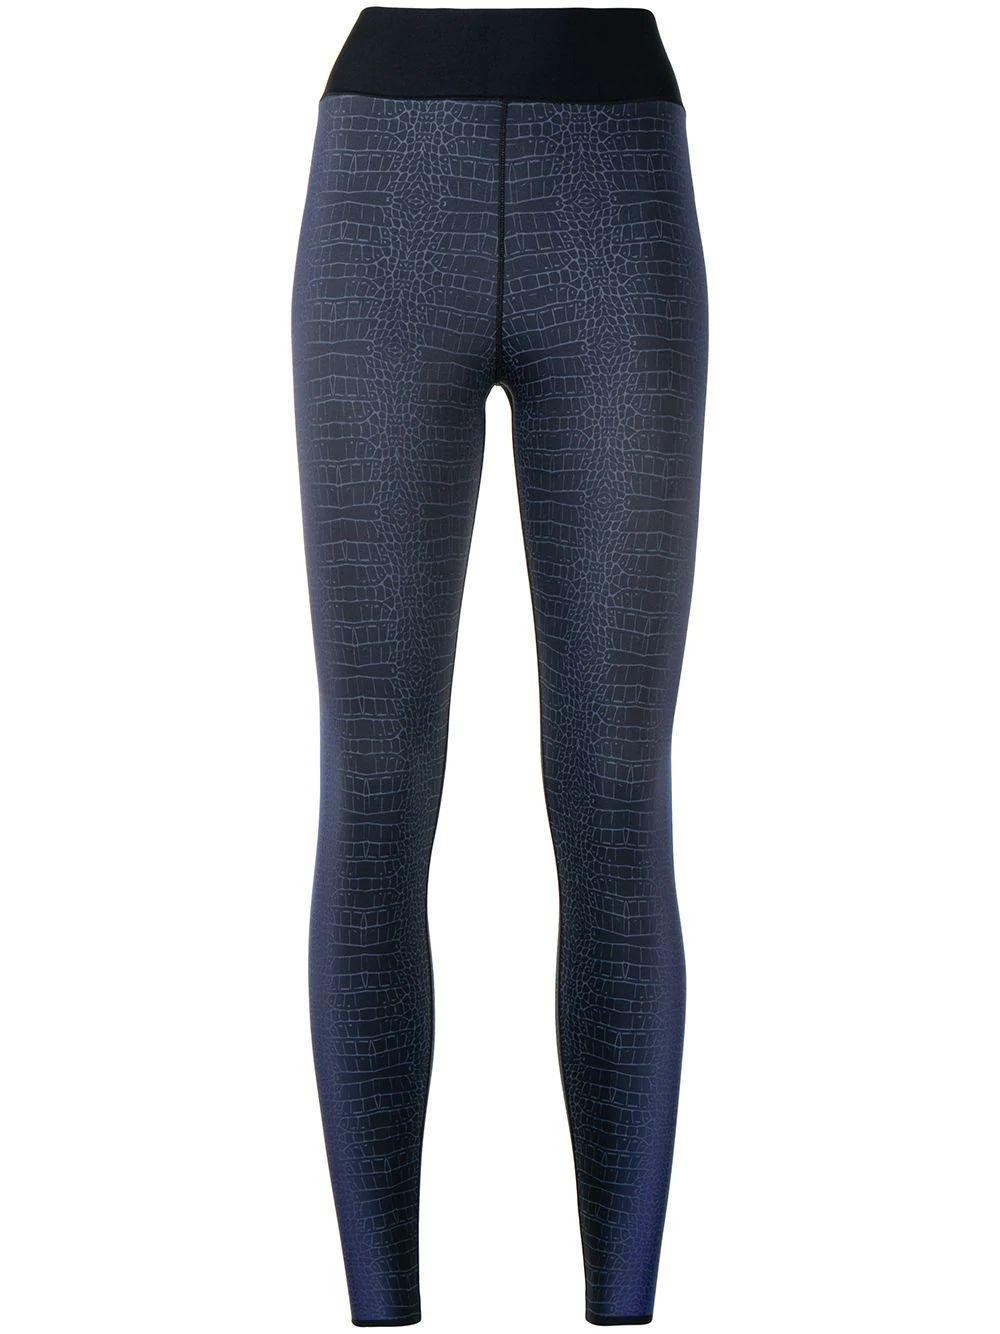 Croco- Print Leggings Item # A520SE302SLKN-H